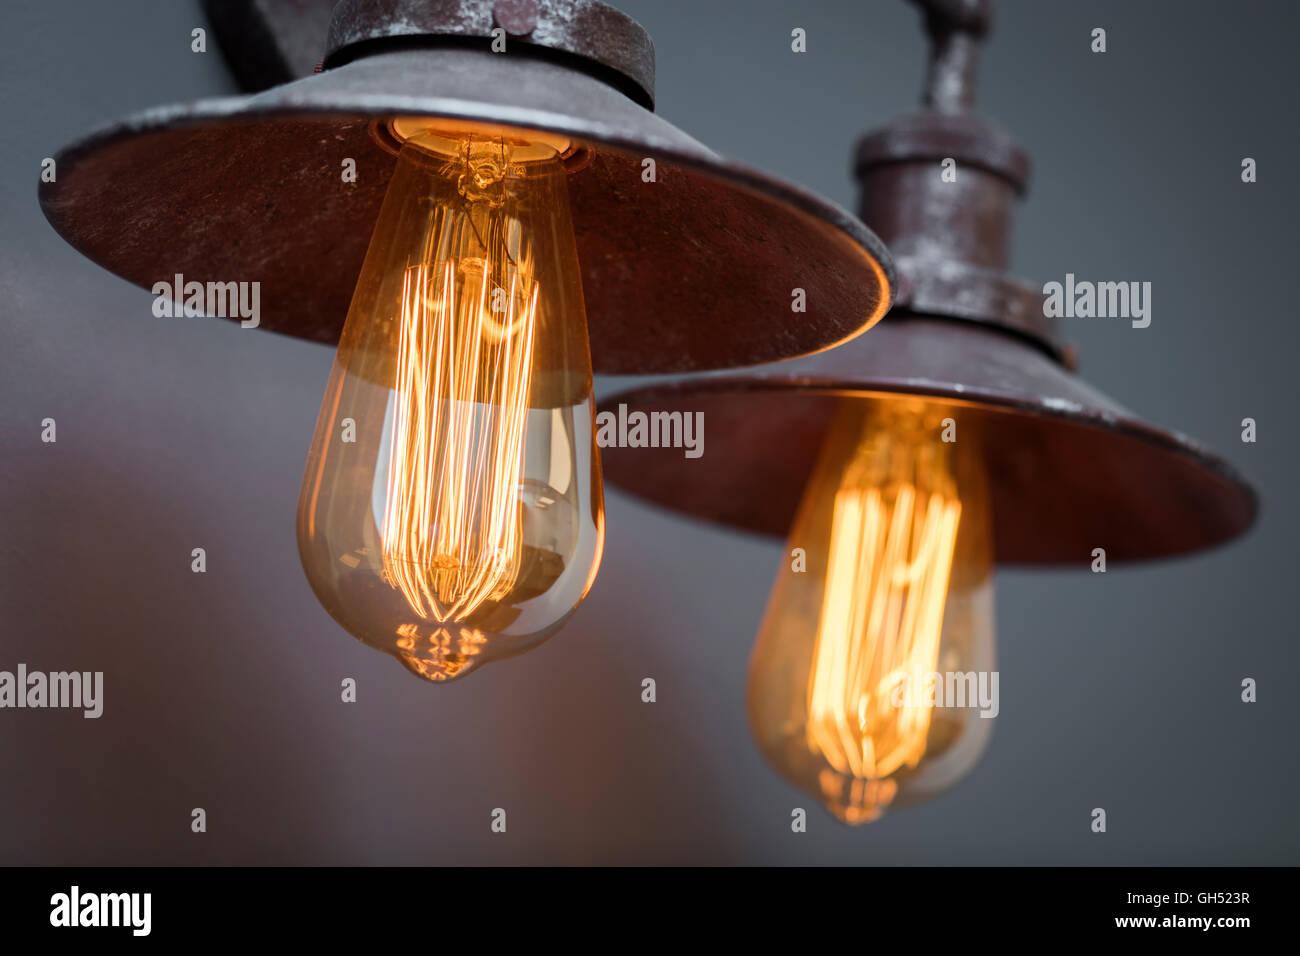 Light fitting 2 - Stock Image